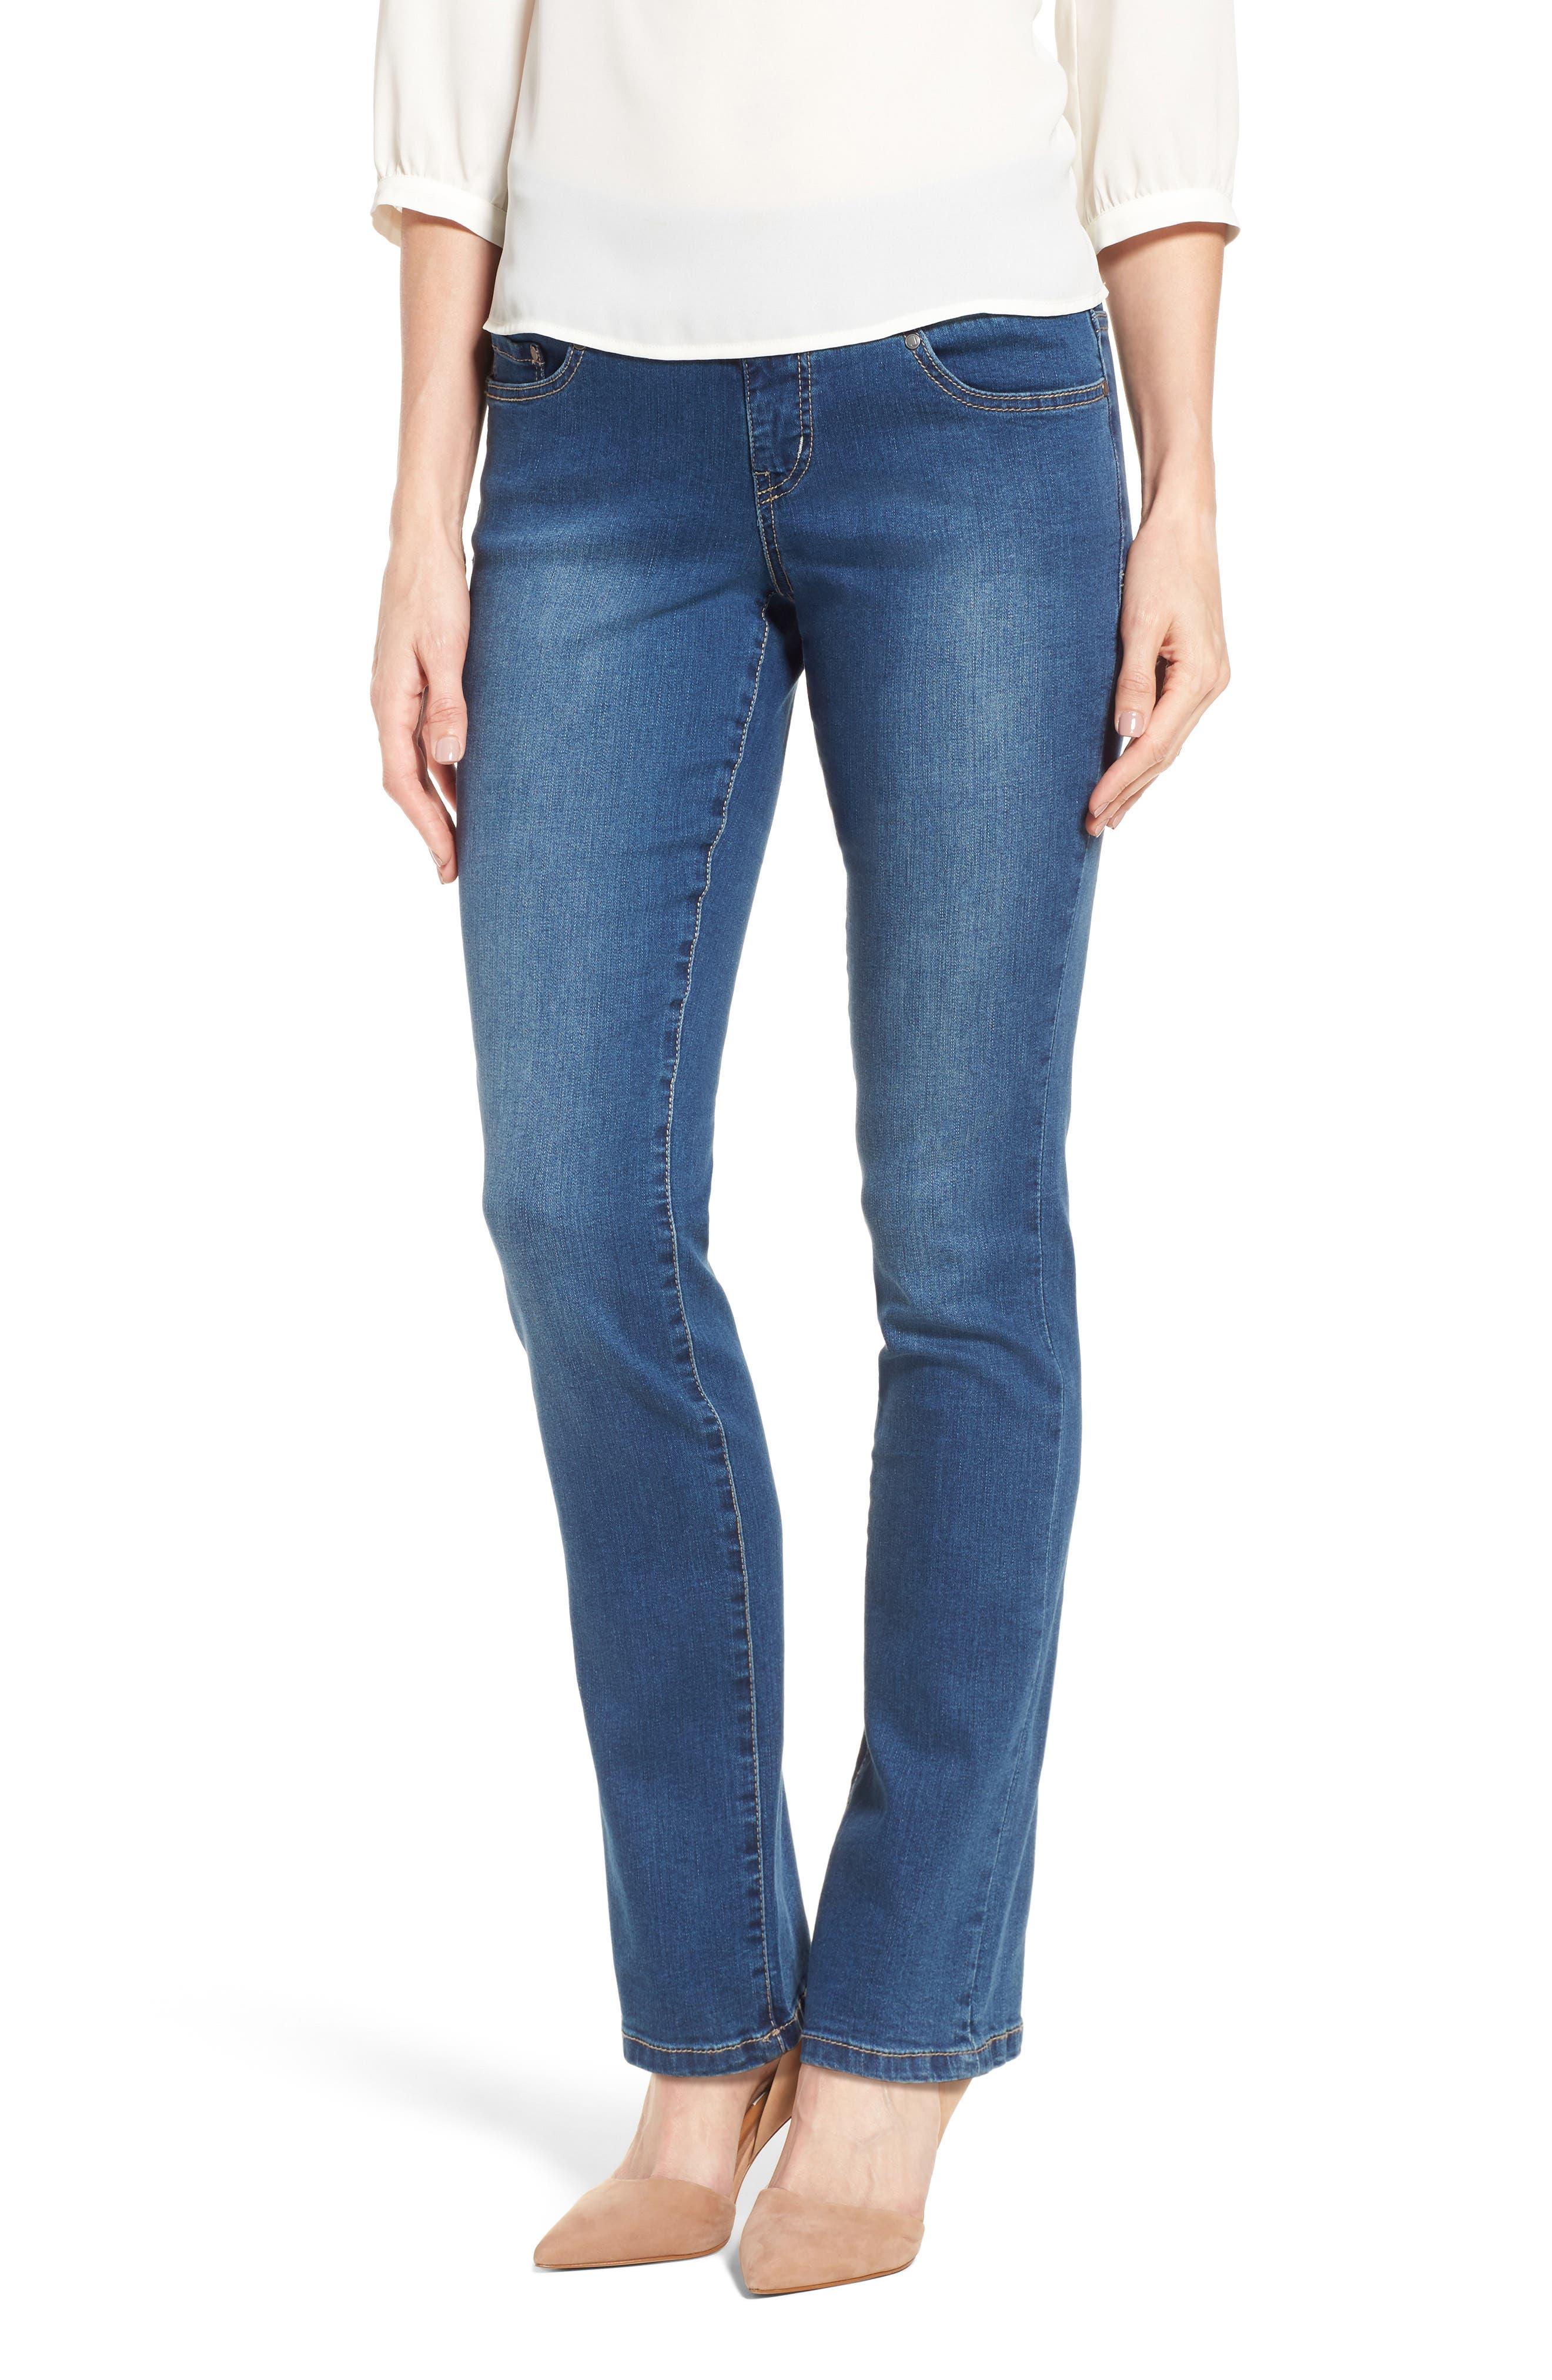 JAG JEANS Peri Pull-On Straight Leg Jeans, Main, color, MEDIUM INDIGO